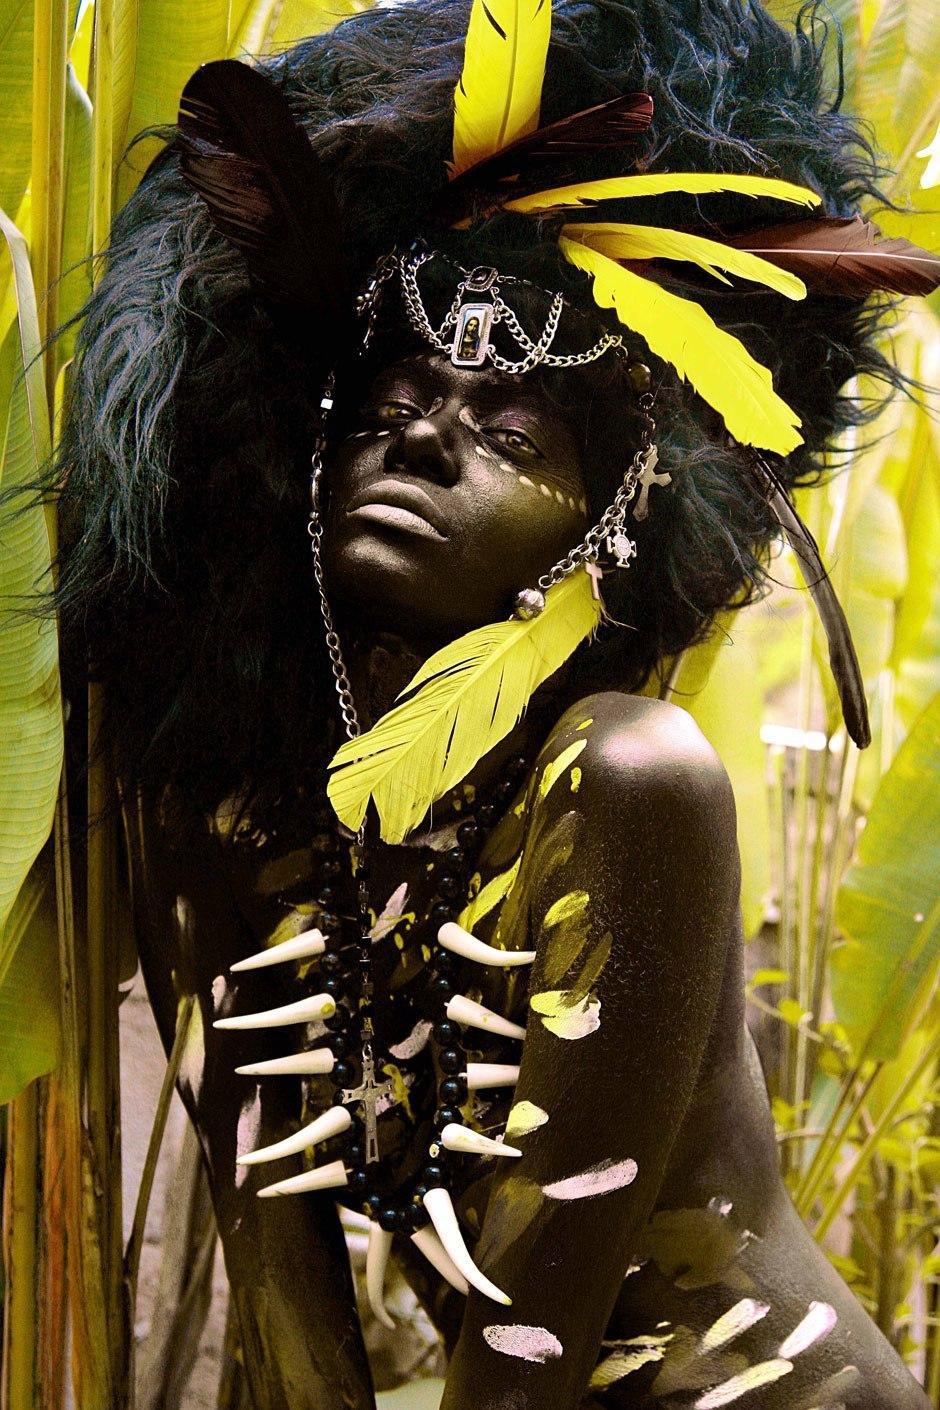 'Africa' by Daniel Bracci (8).jpg